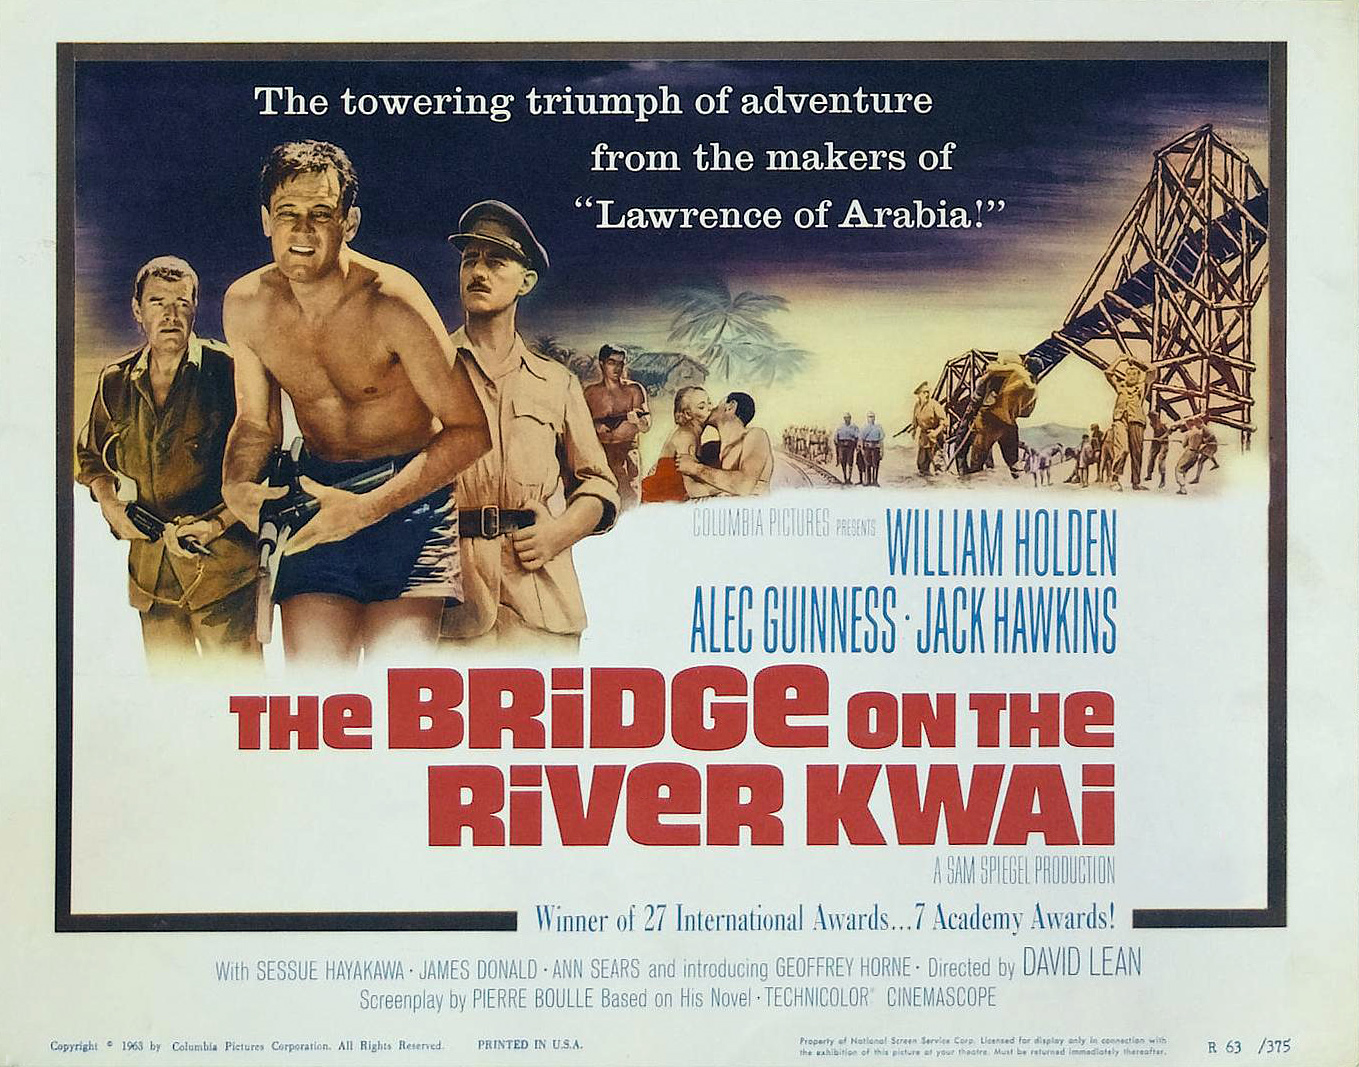 Sri Lanka to rebuild Bridge On The River Kwai | Daily Mail ... |The Bridge On The River Kwai (1957)